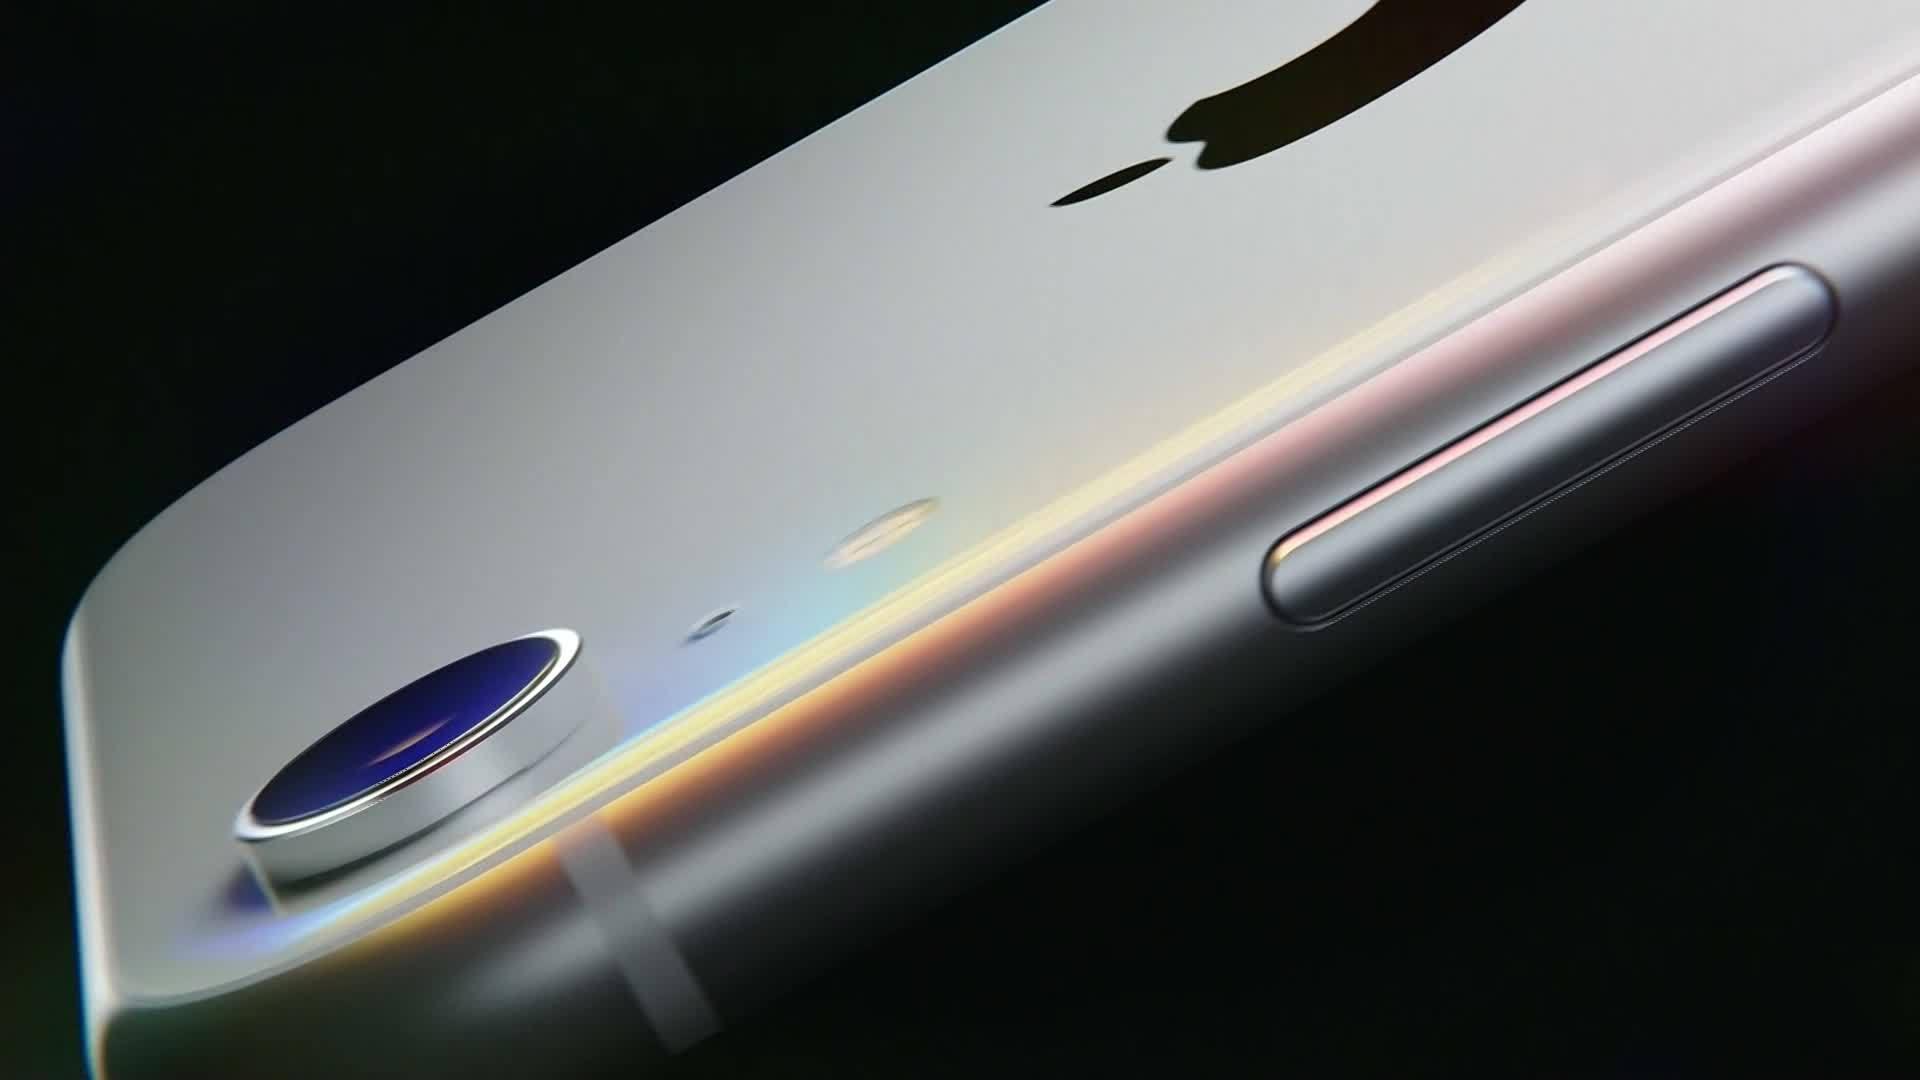 iPhone Facetime bug lets you eavesdrop